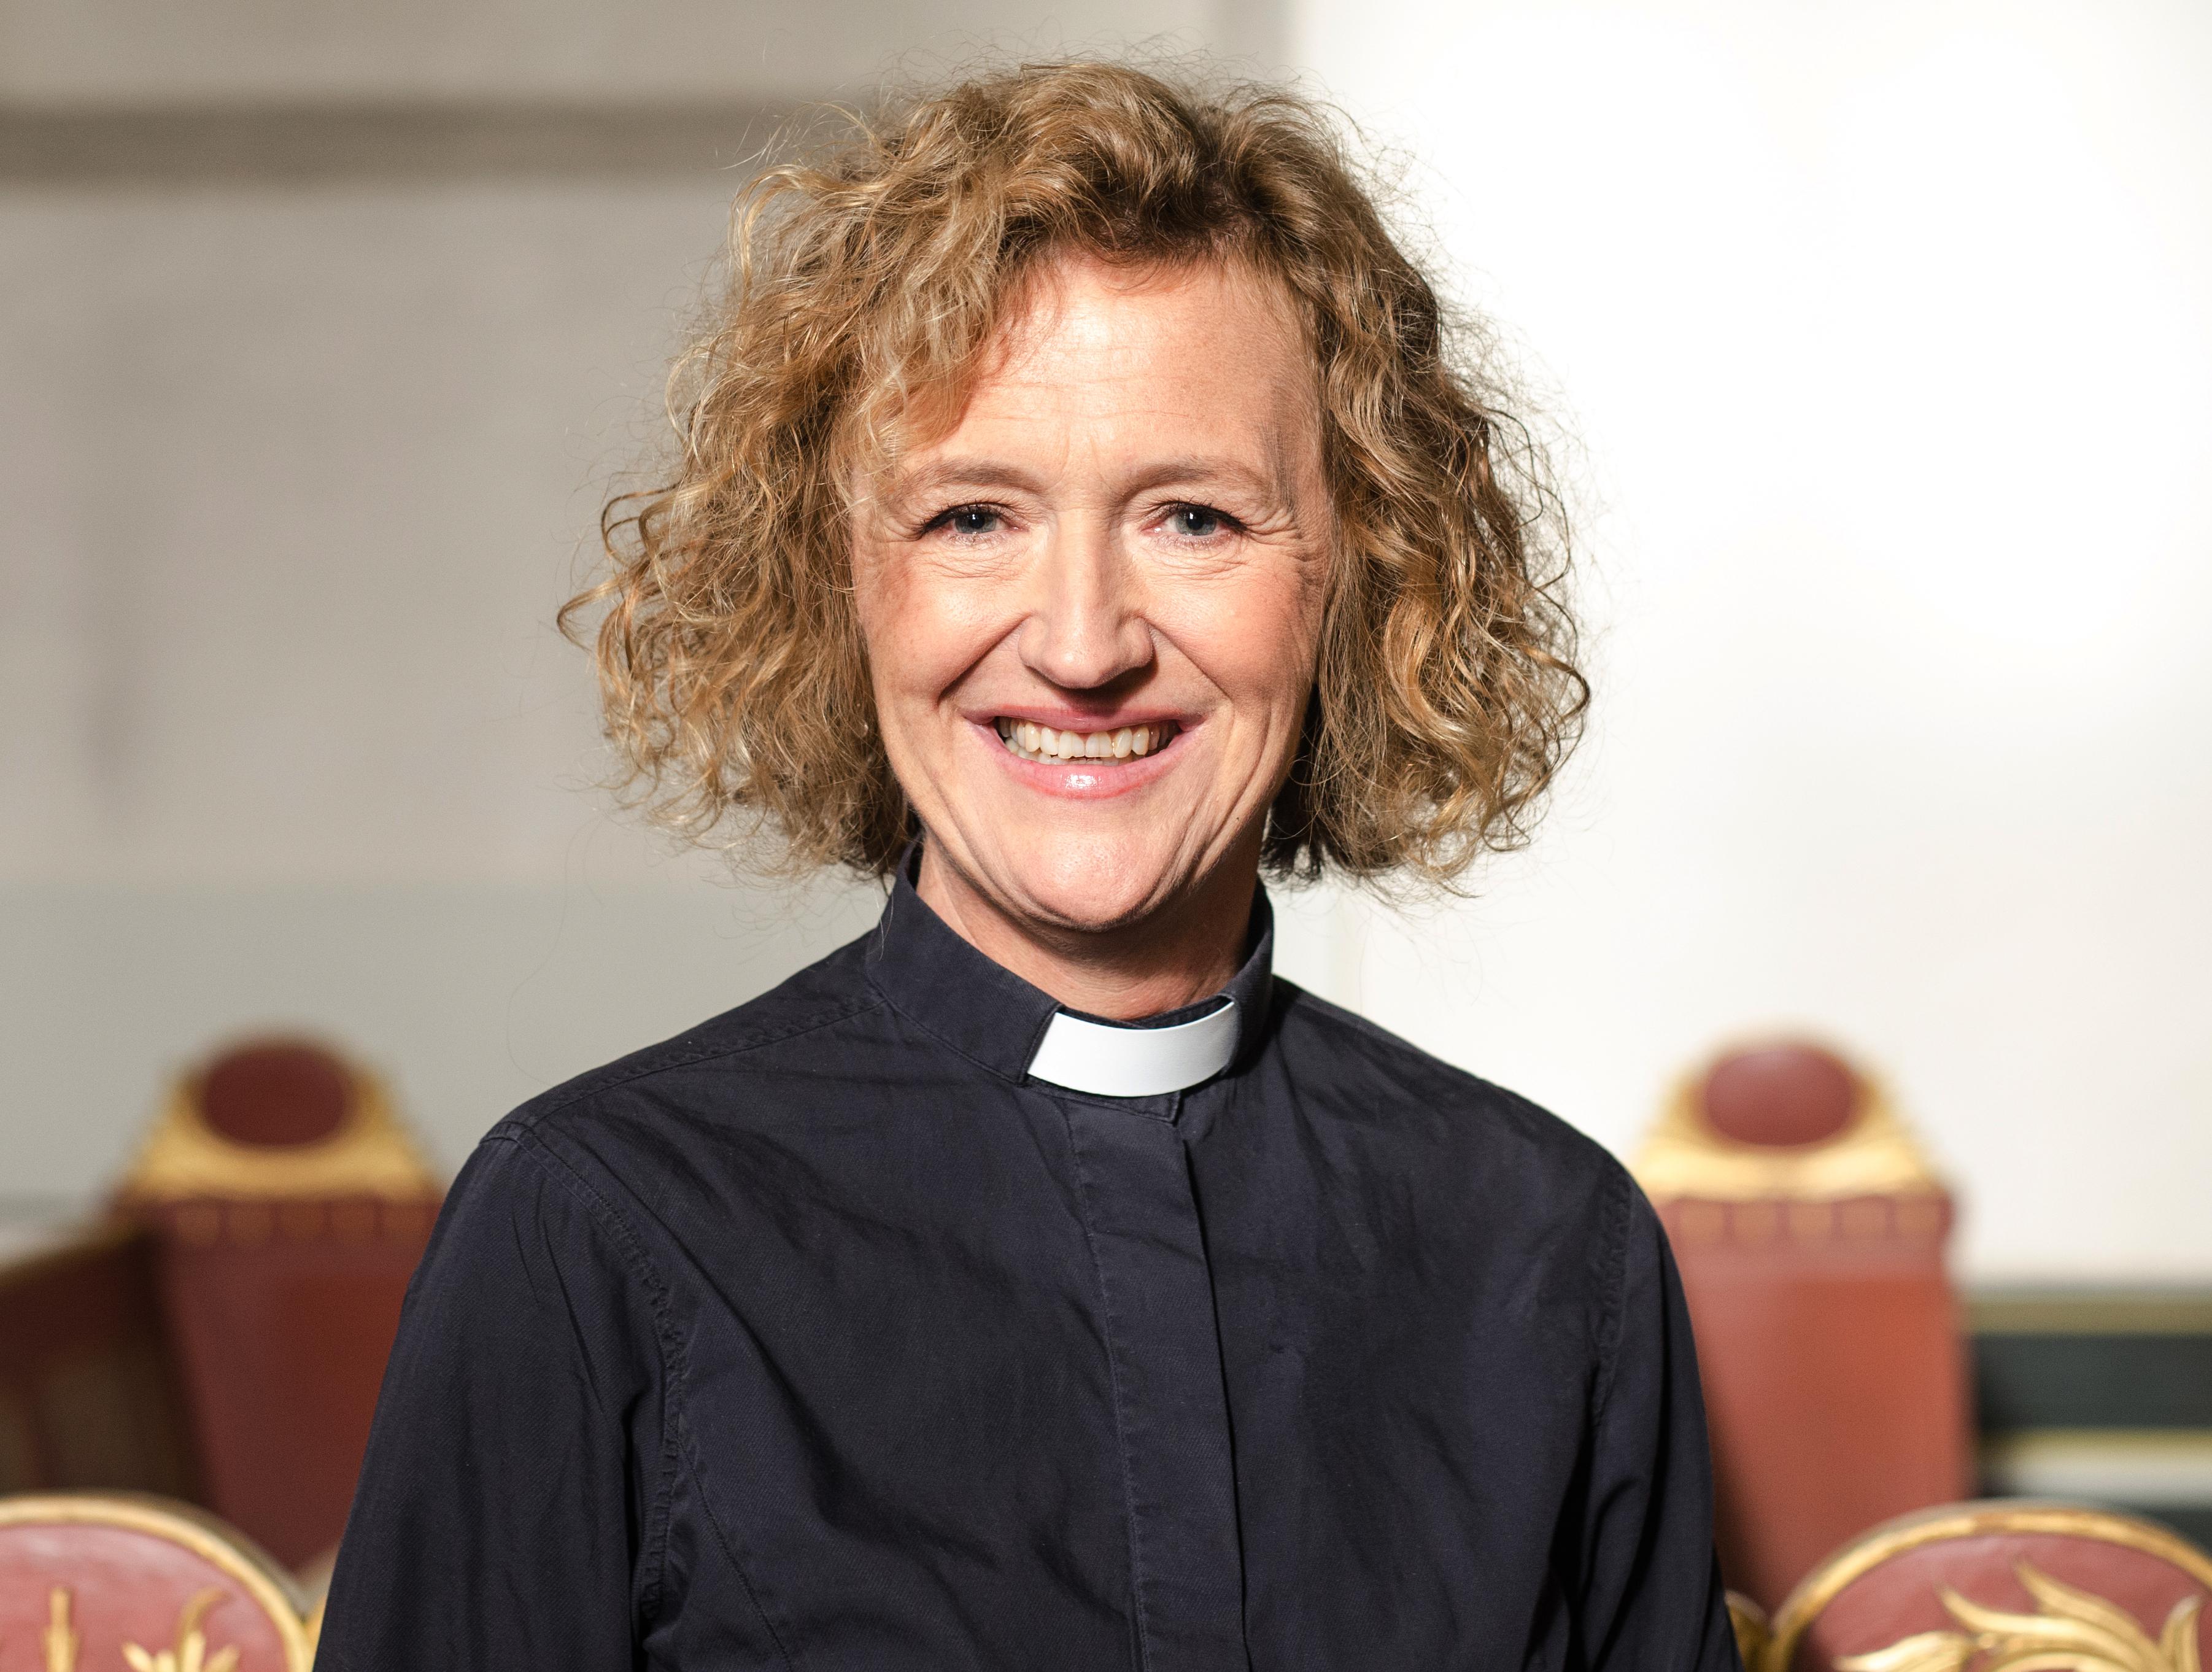 biskop norge